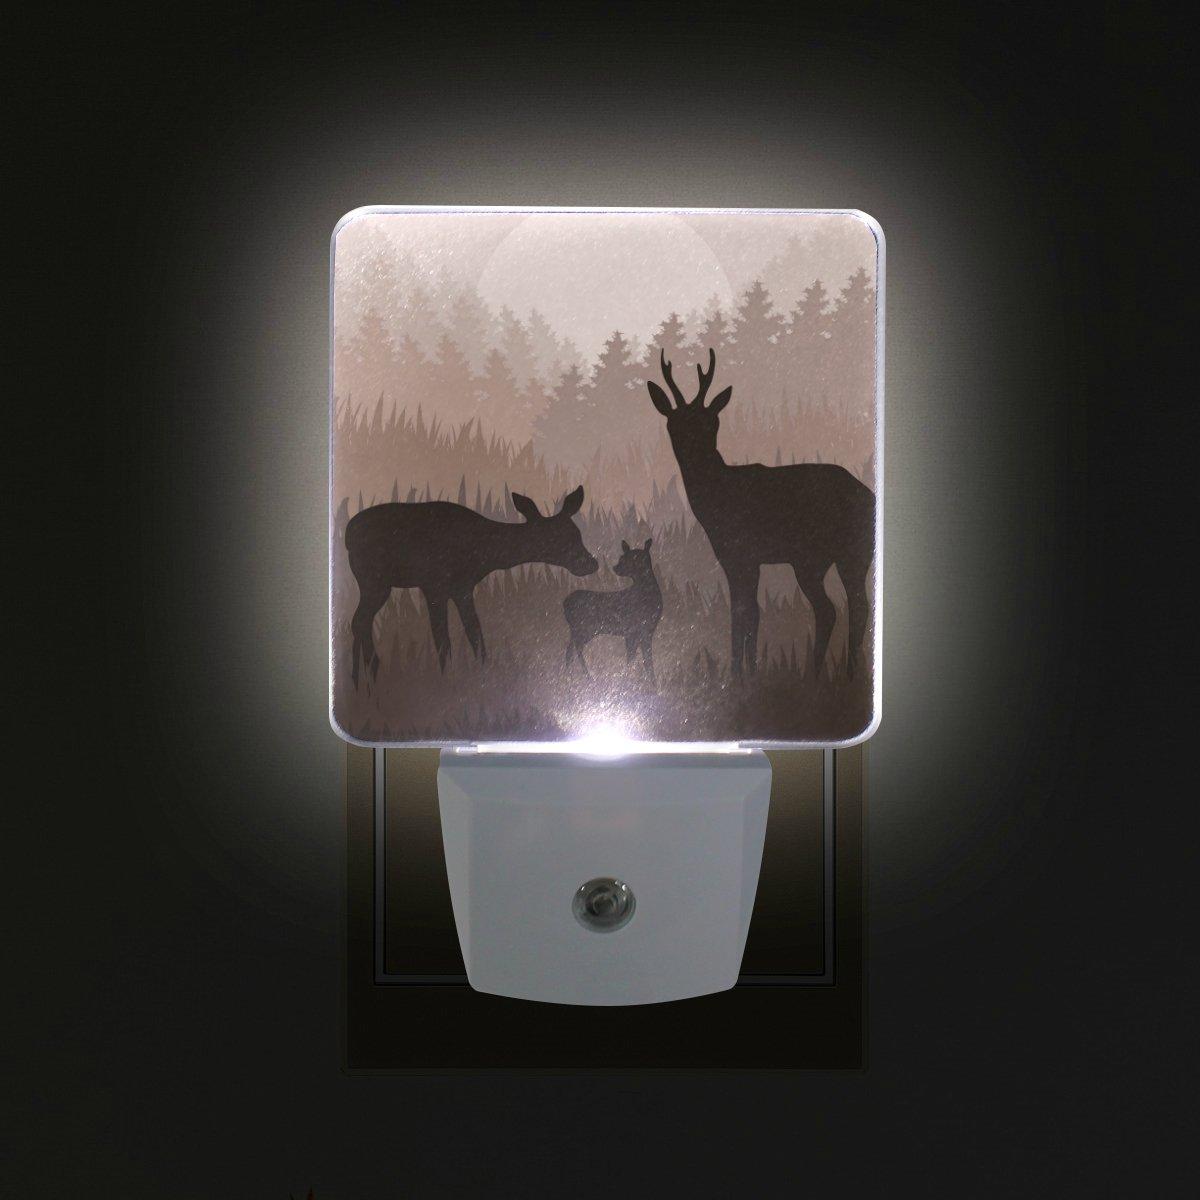 giovanior Deer Family in Wild Night Forestパターンプラグin Dusk to DawnライトセンサーLEDナイトライトウォールライトの寝室、バスルーム、廊下、階段、エネルギー効率的な B079P1F1LL 15675